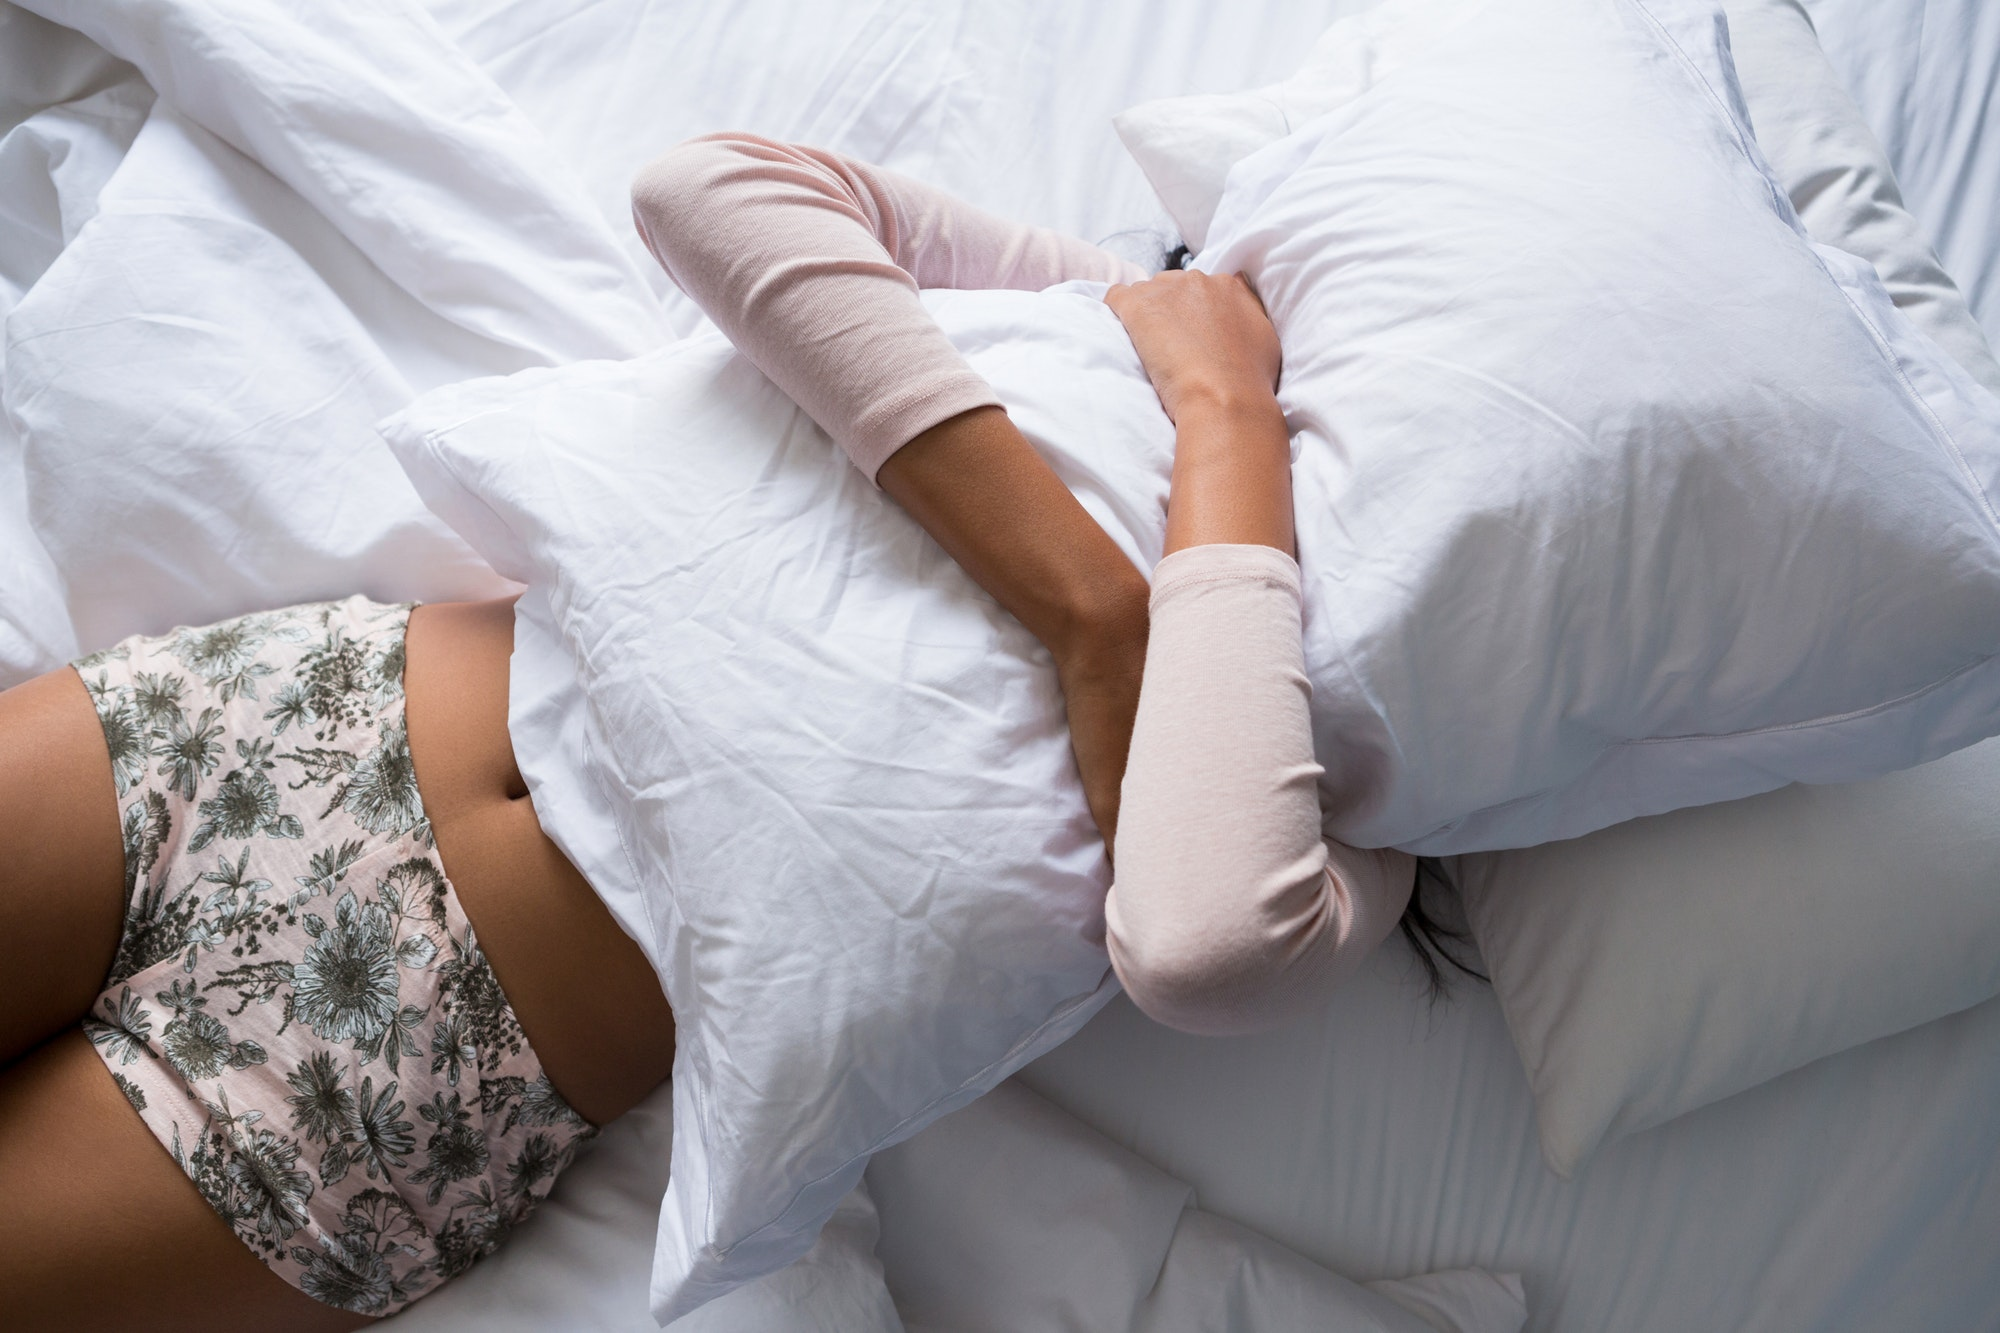 Do women sleep differently than men